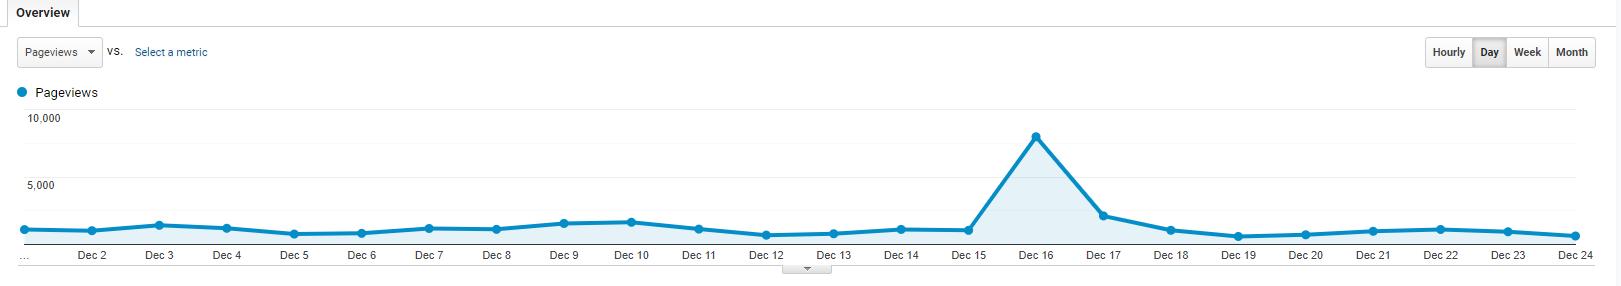 Google Analytics spike in traffice on December 16th.